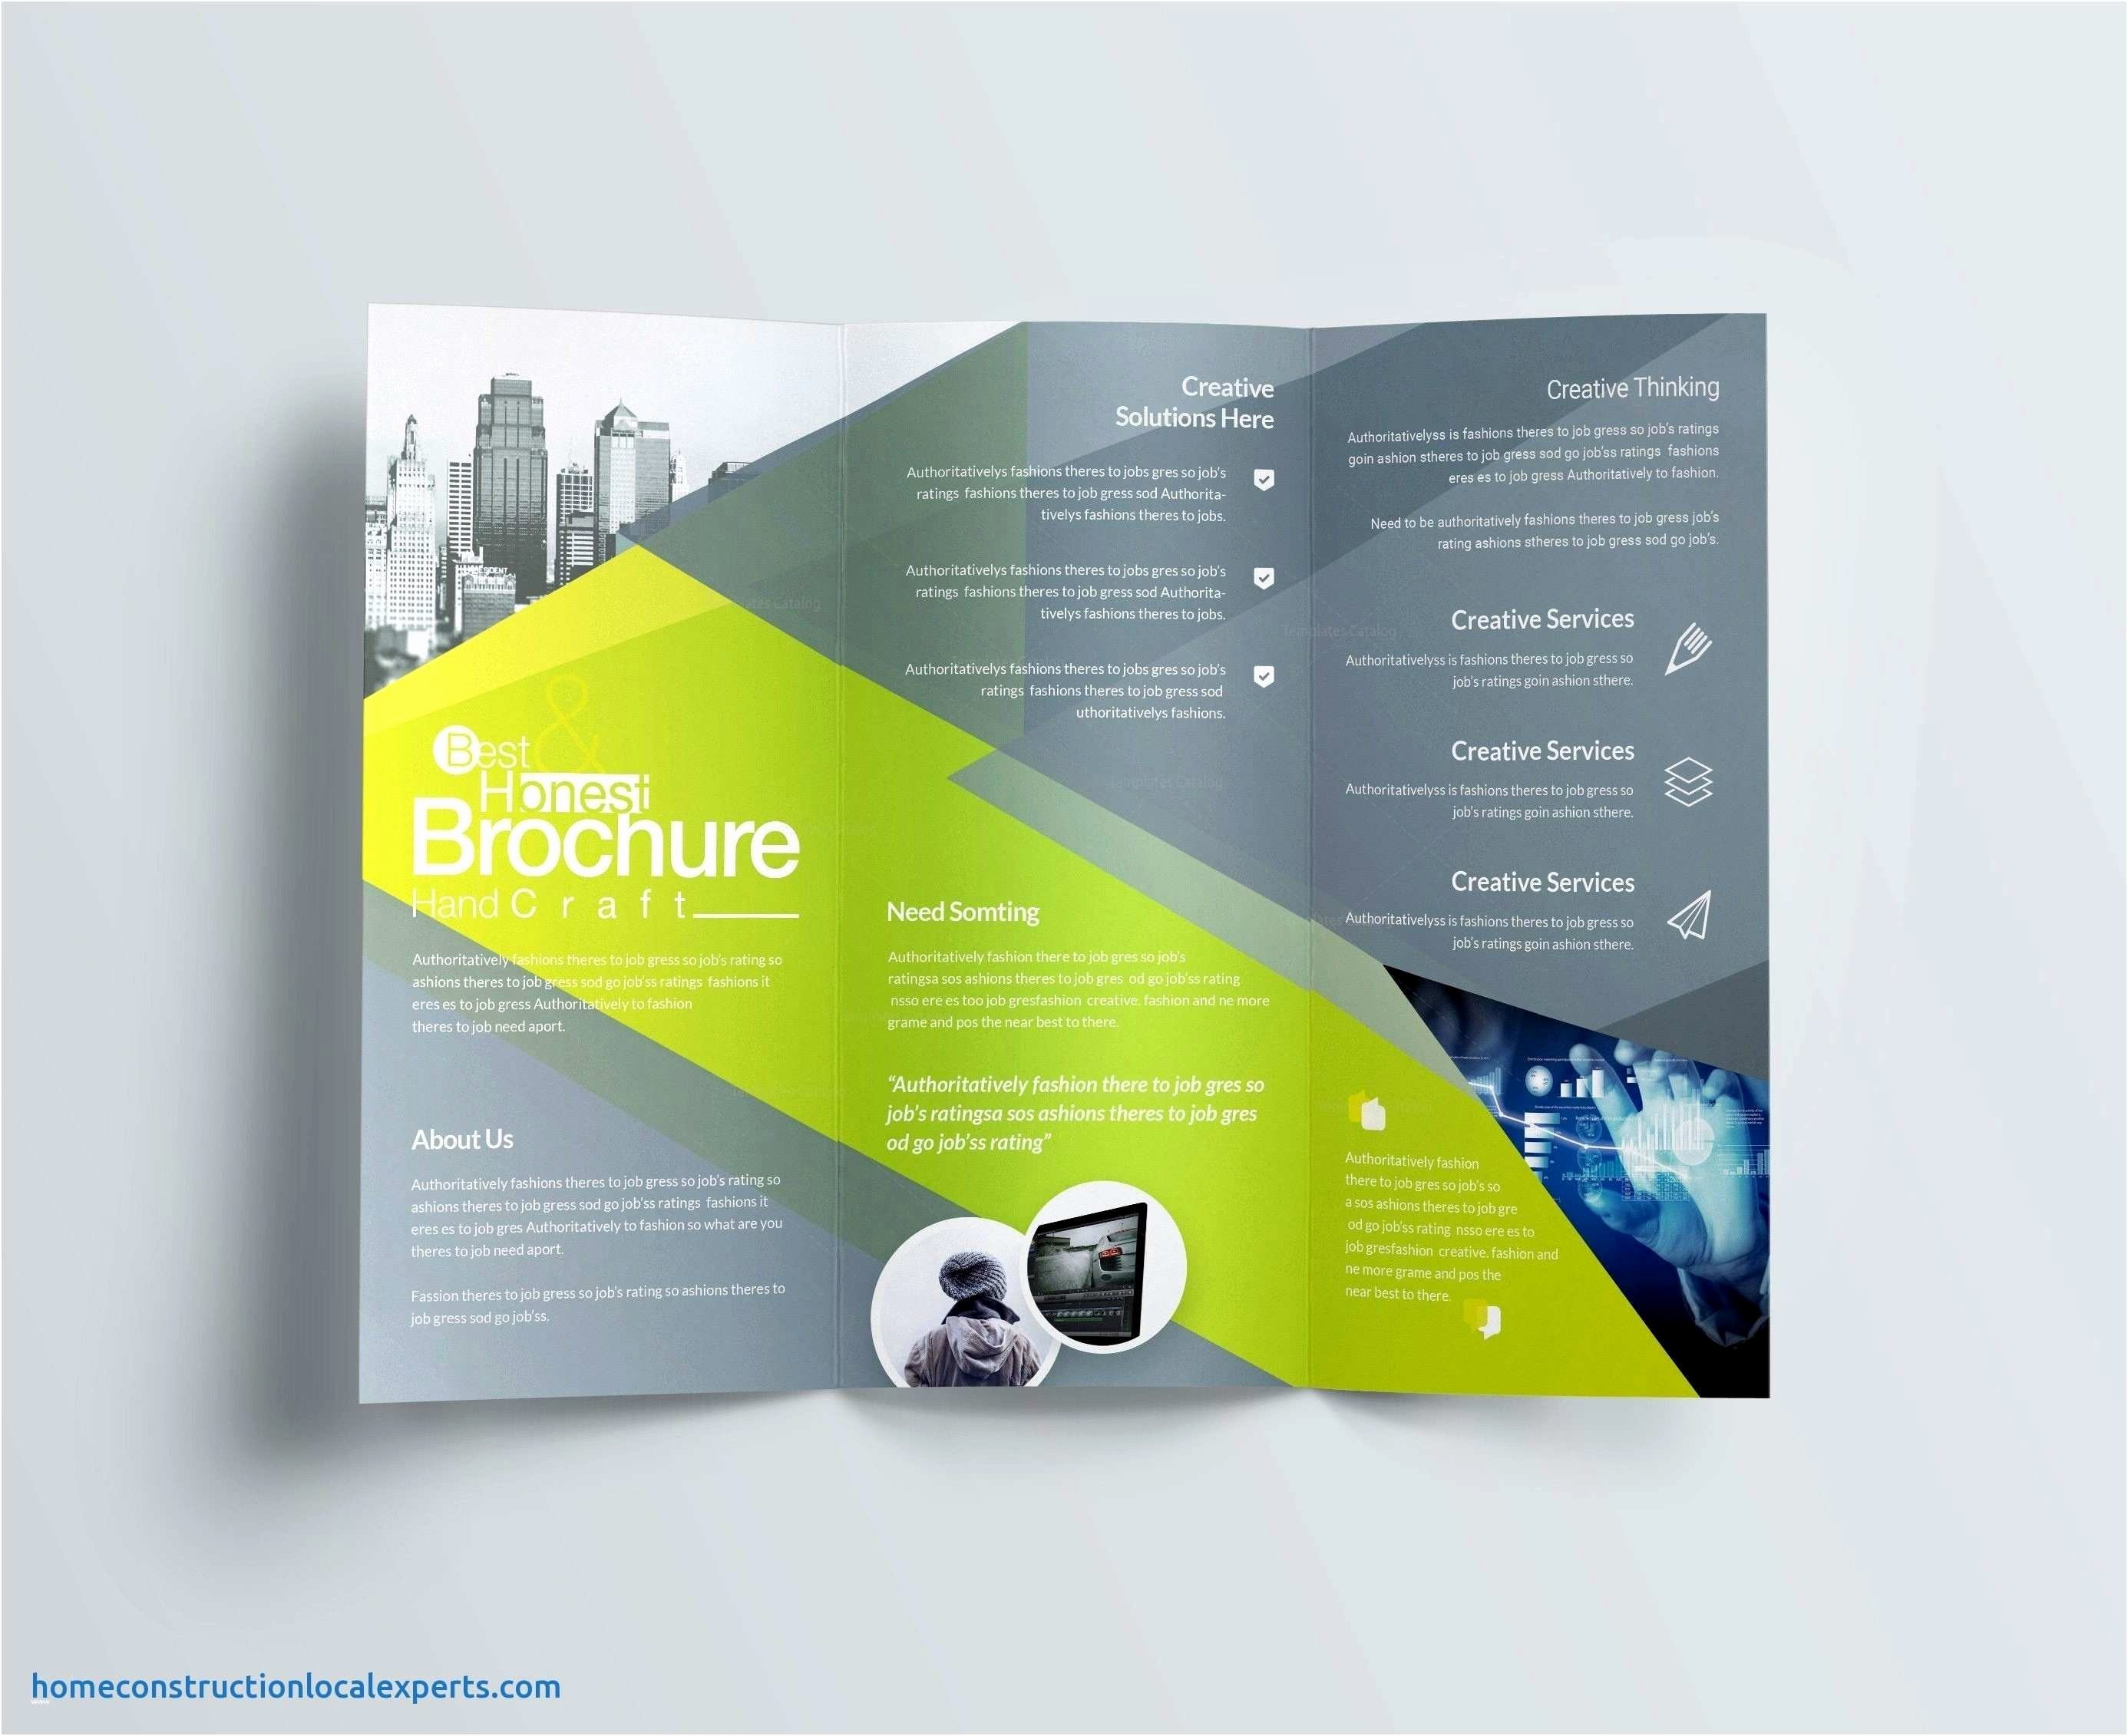 Adobe Indesign Business Card Template Beautiful Adobe